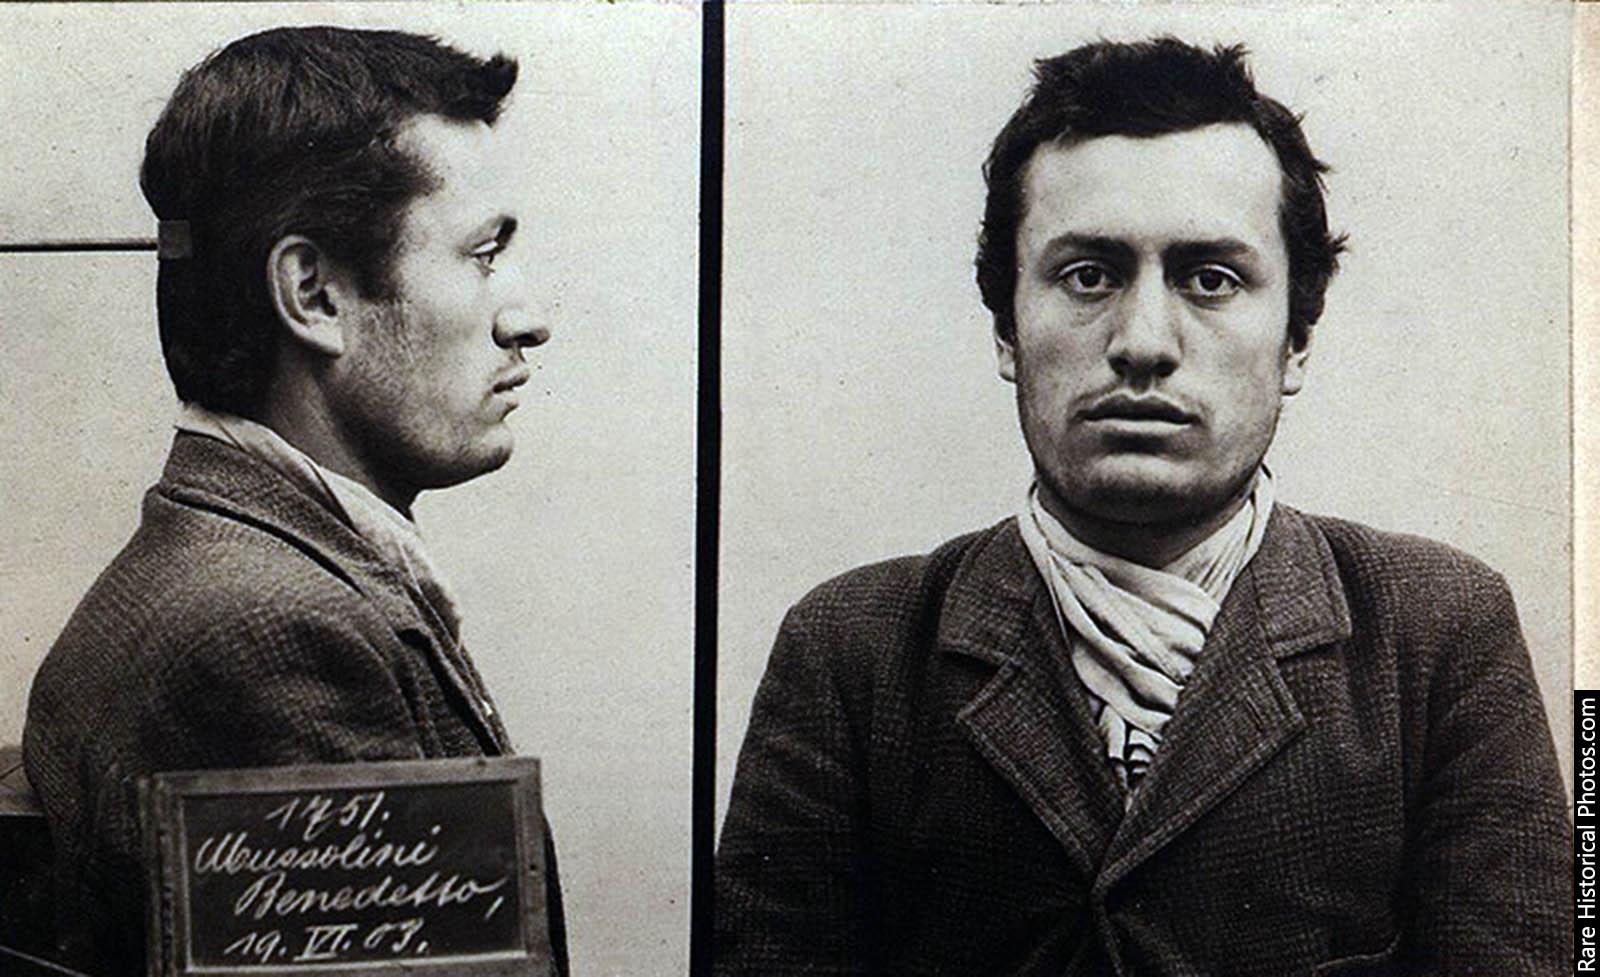 Benito Mussolini, mugshot, 1903